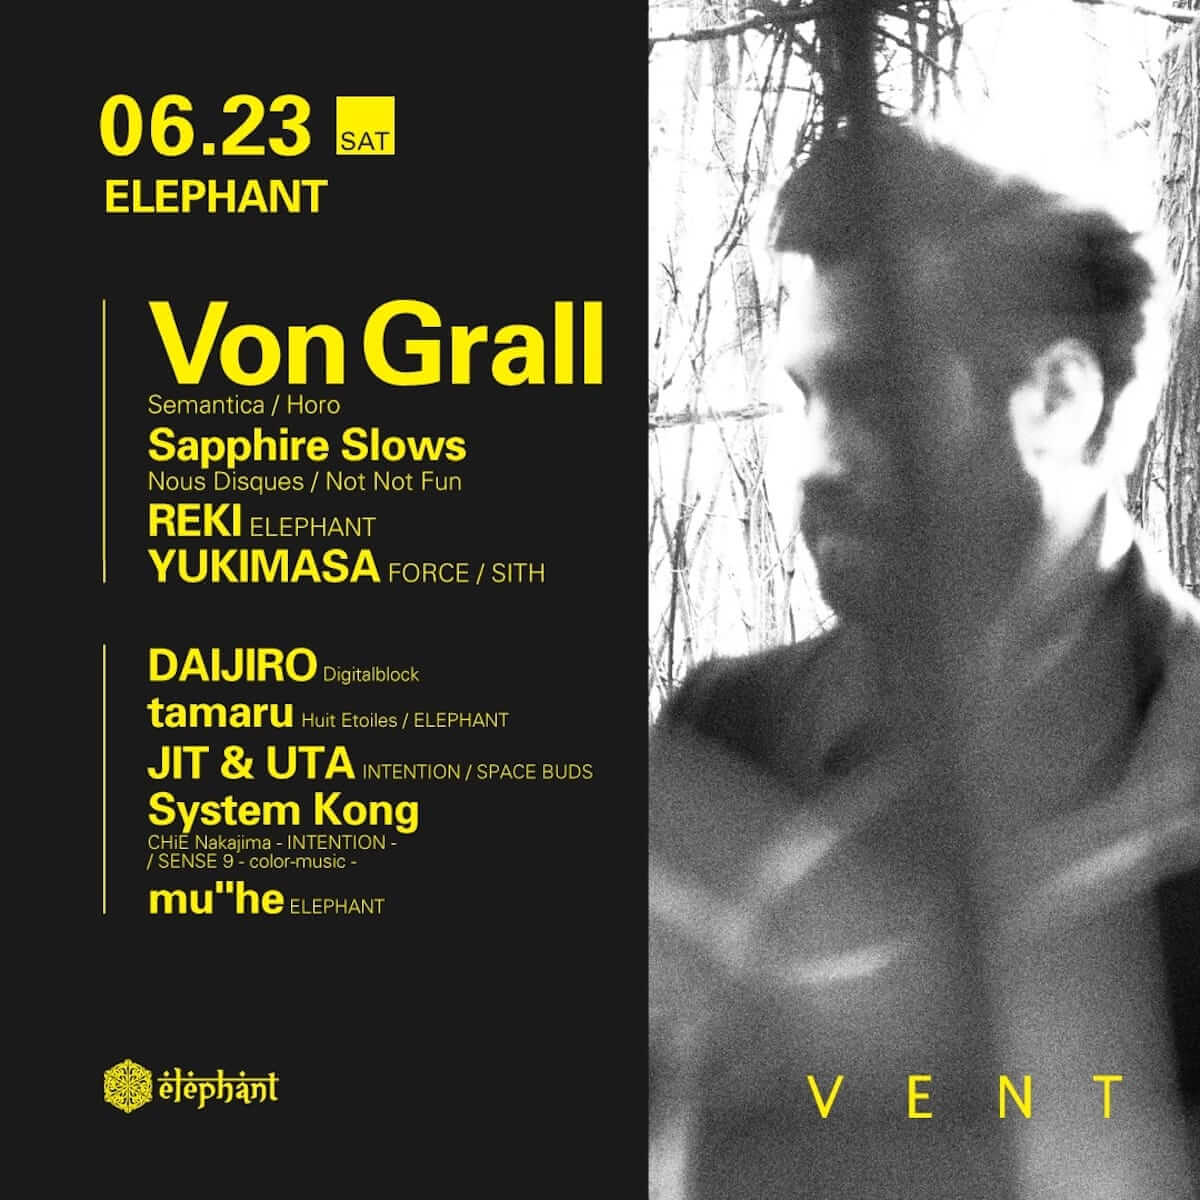 Svrecaも激推しするVon GrallがVENTで開催の「ELEPHANT」にて来日|Sapphire Slowsも出演 music180619_vent_von_grall_1-1200x1200